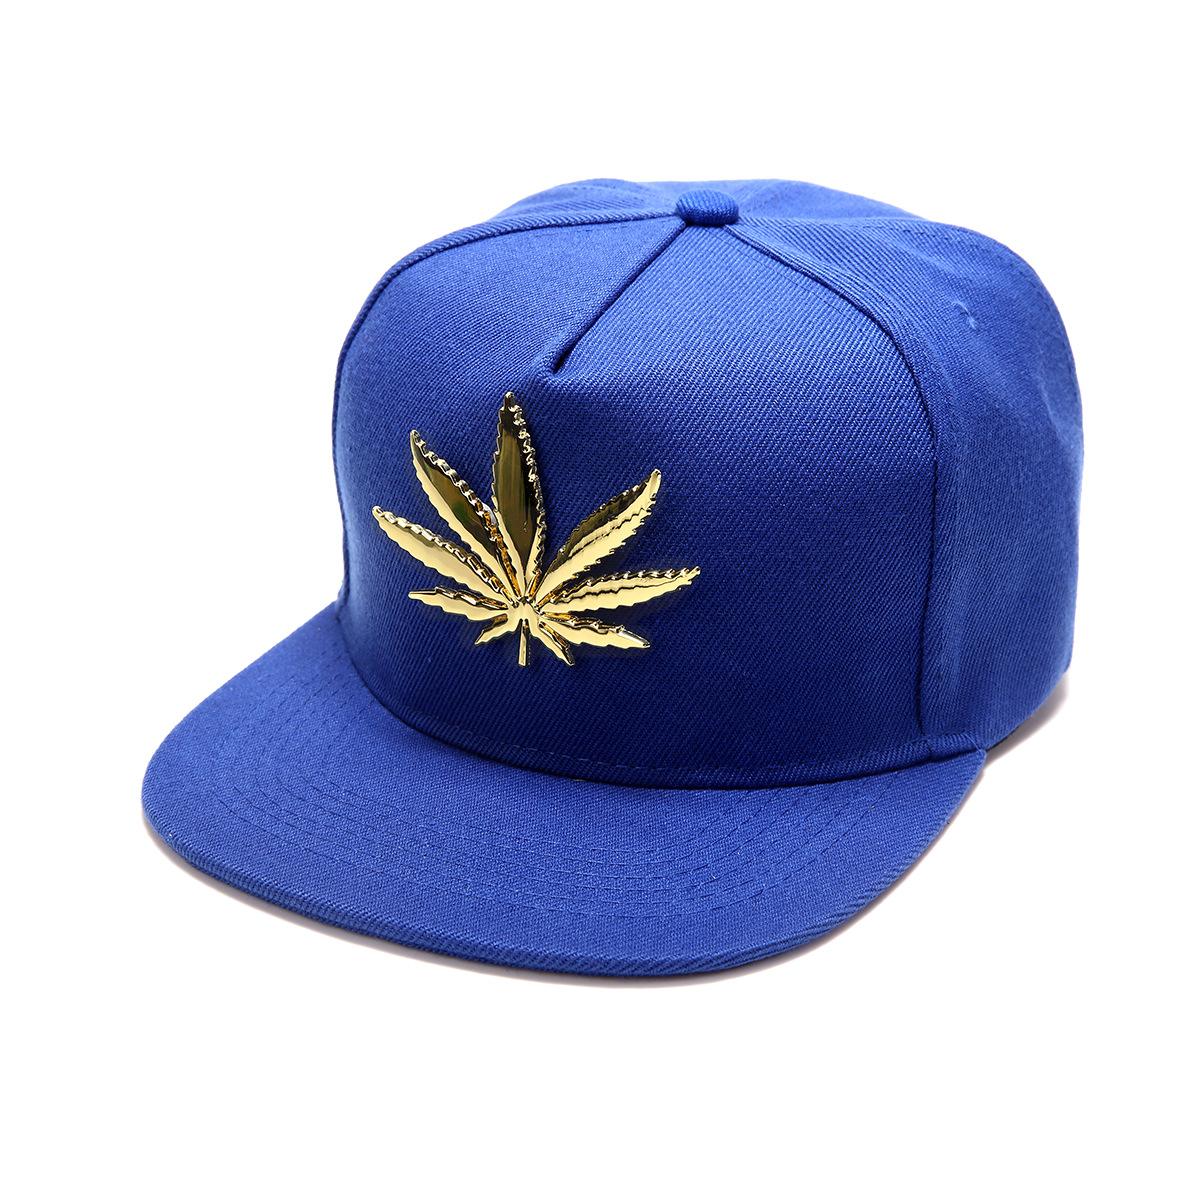 Hat - Weed Cotton Hip Hop Cap